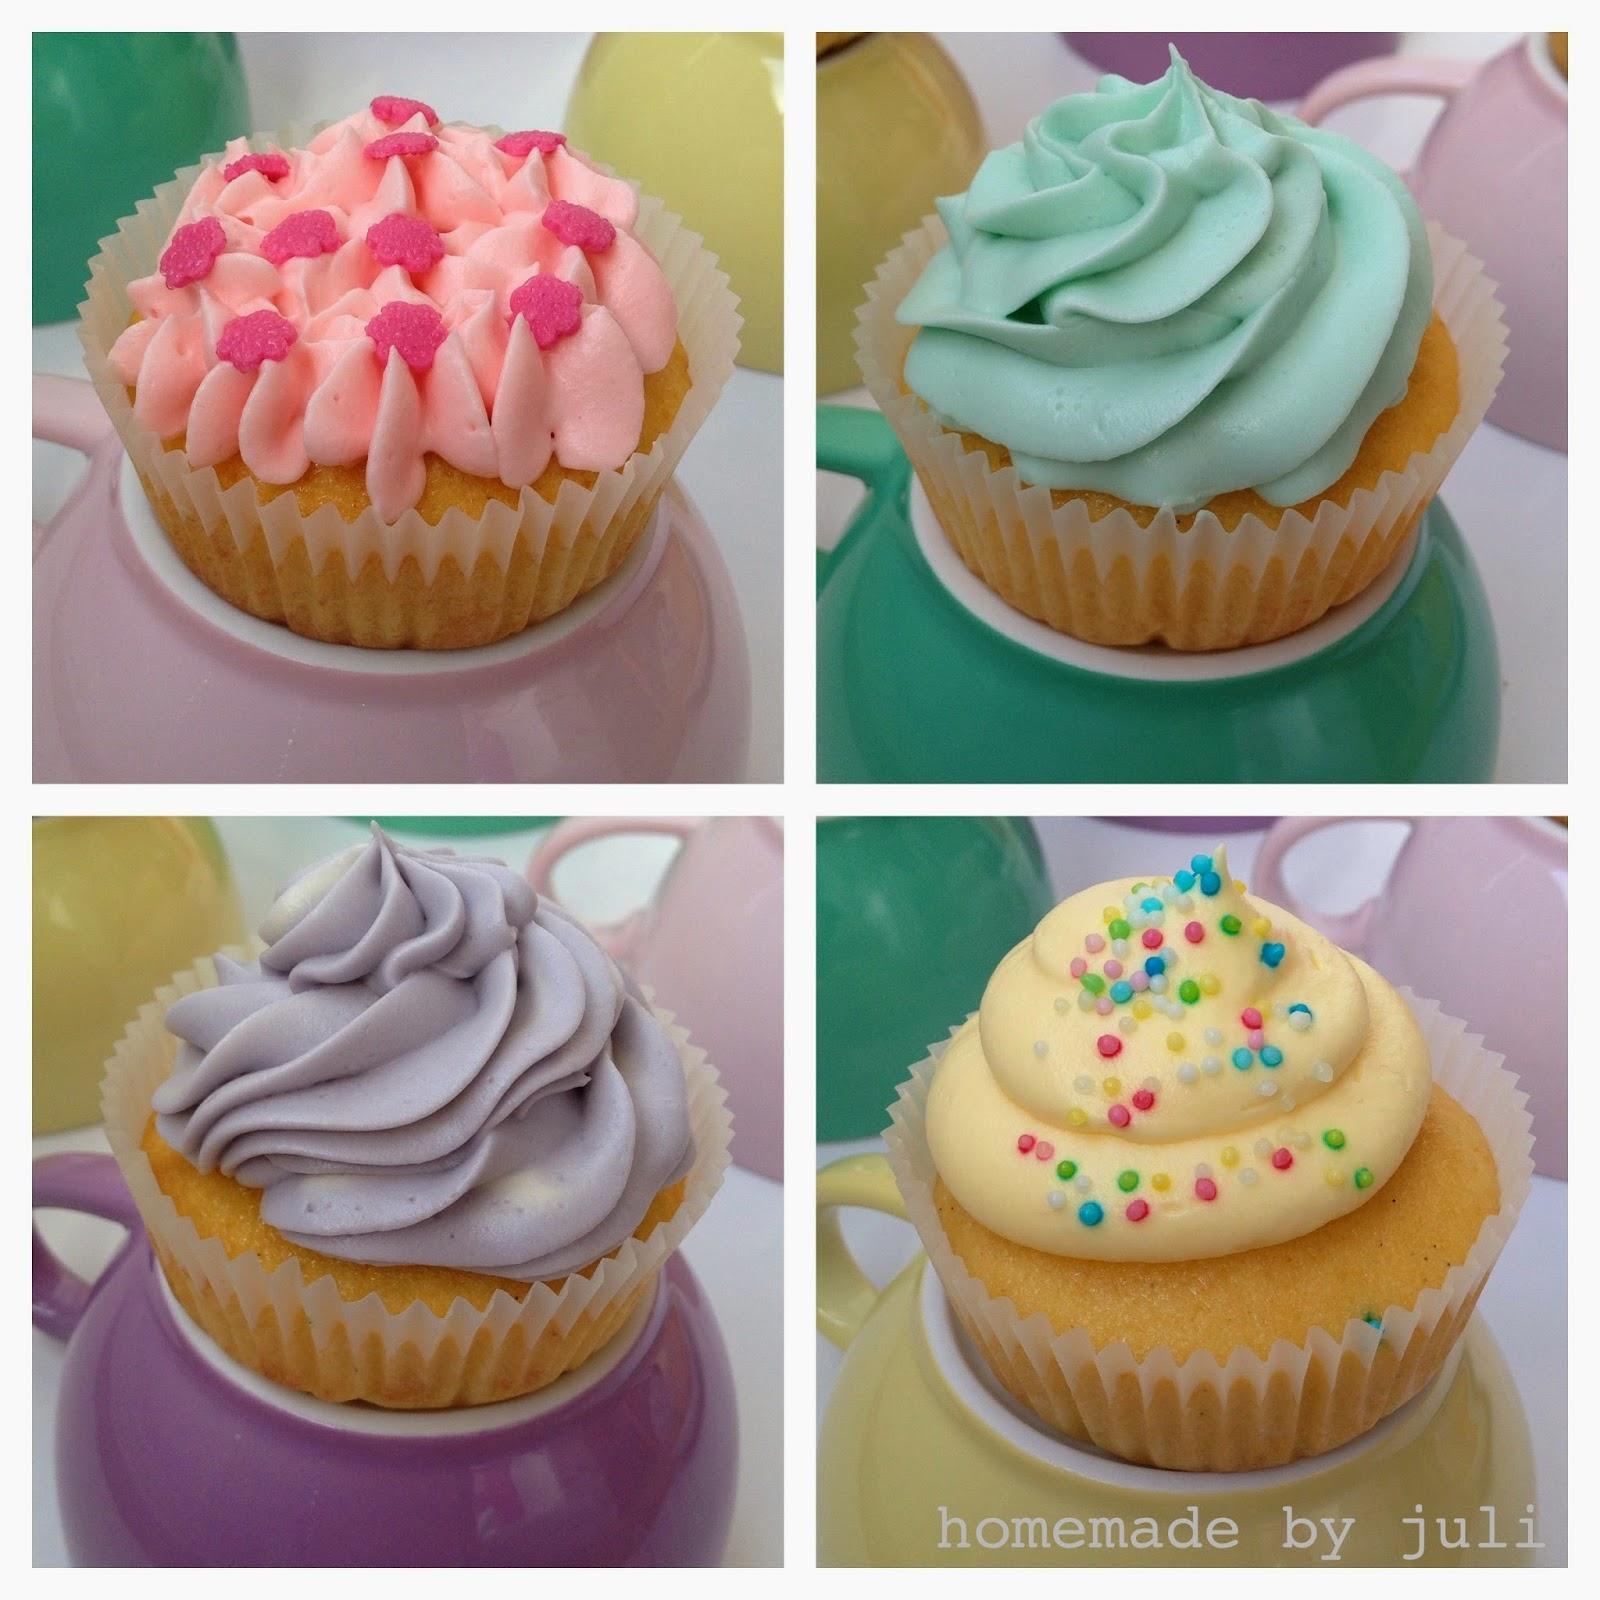 HOMEMADE by Juli: Vanilla Bean Pastell Cupcakes